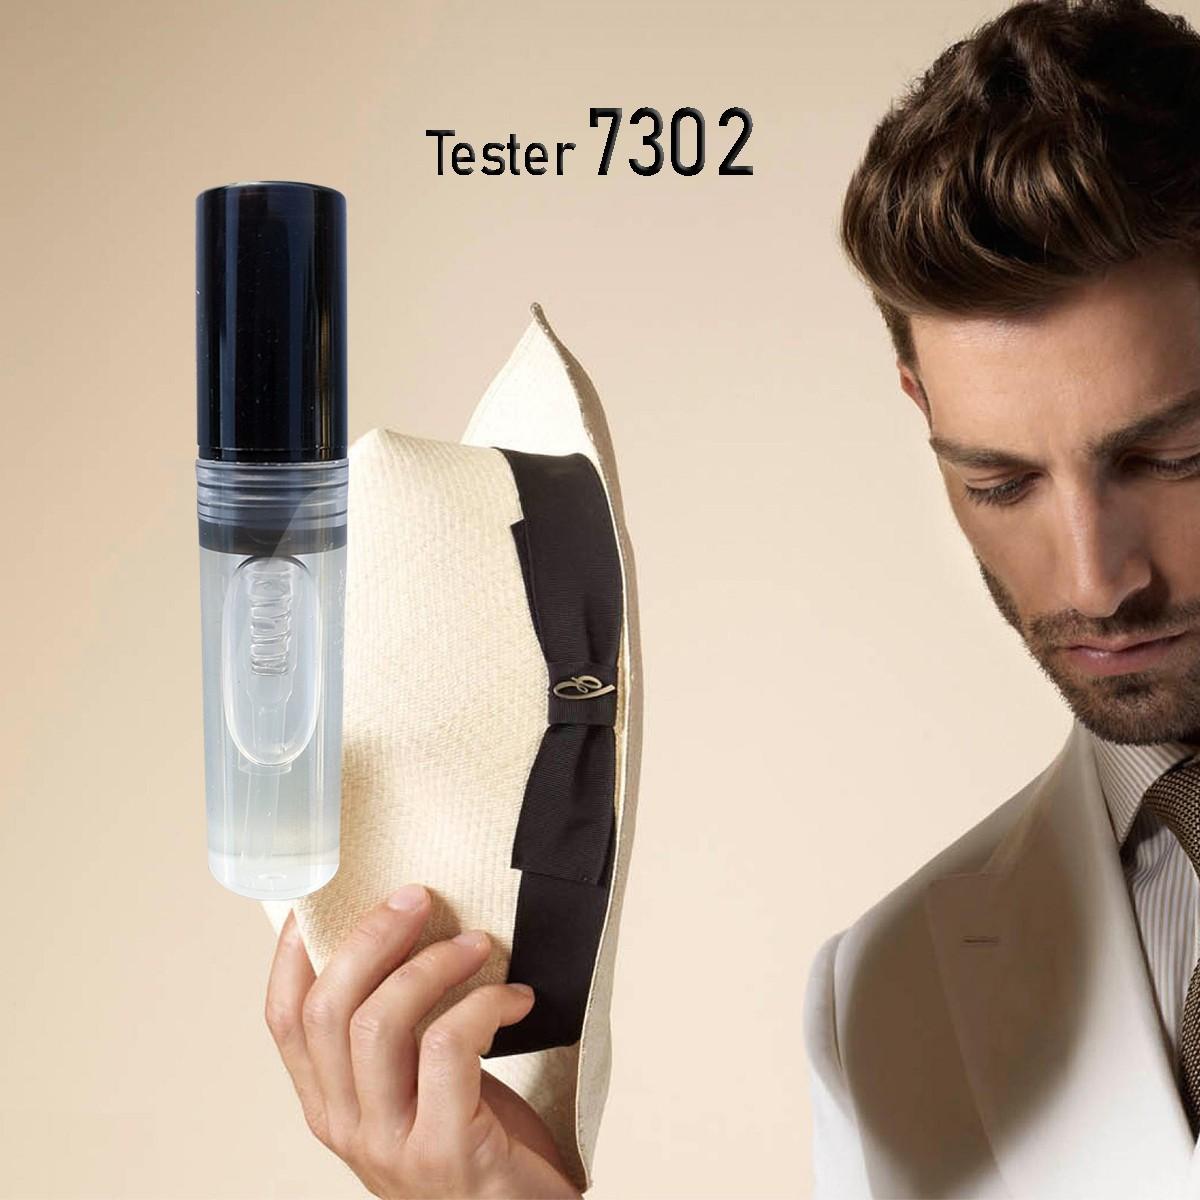 Tester7302